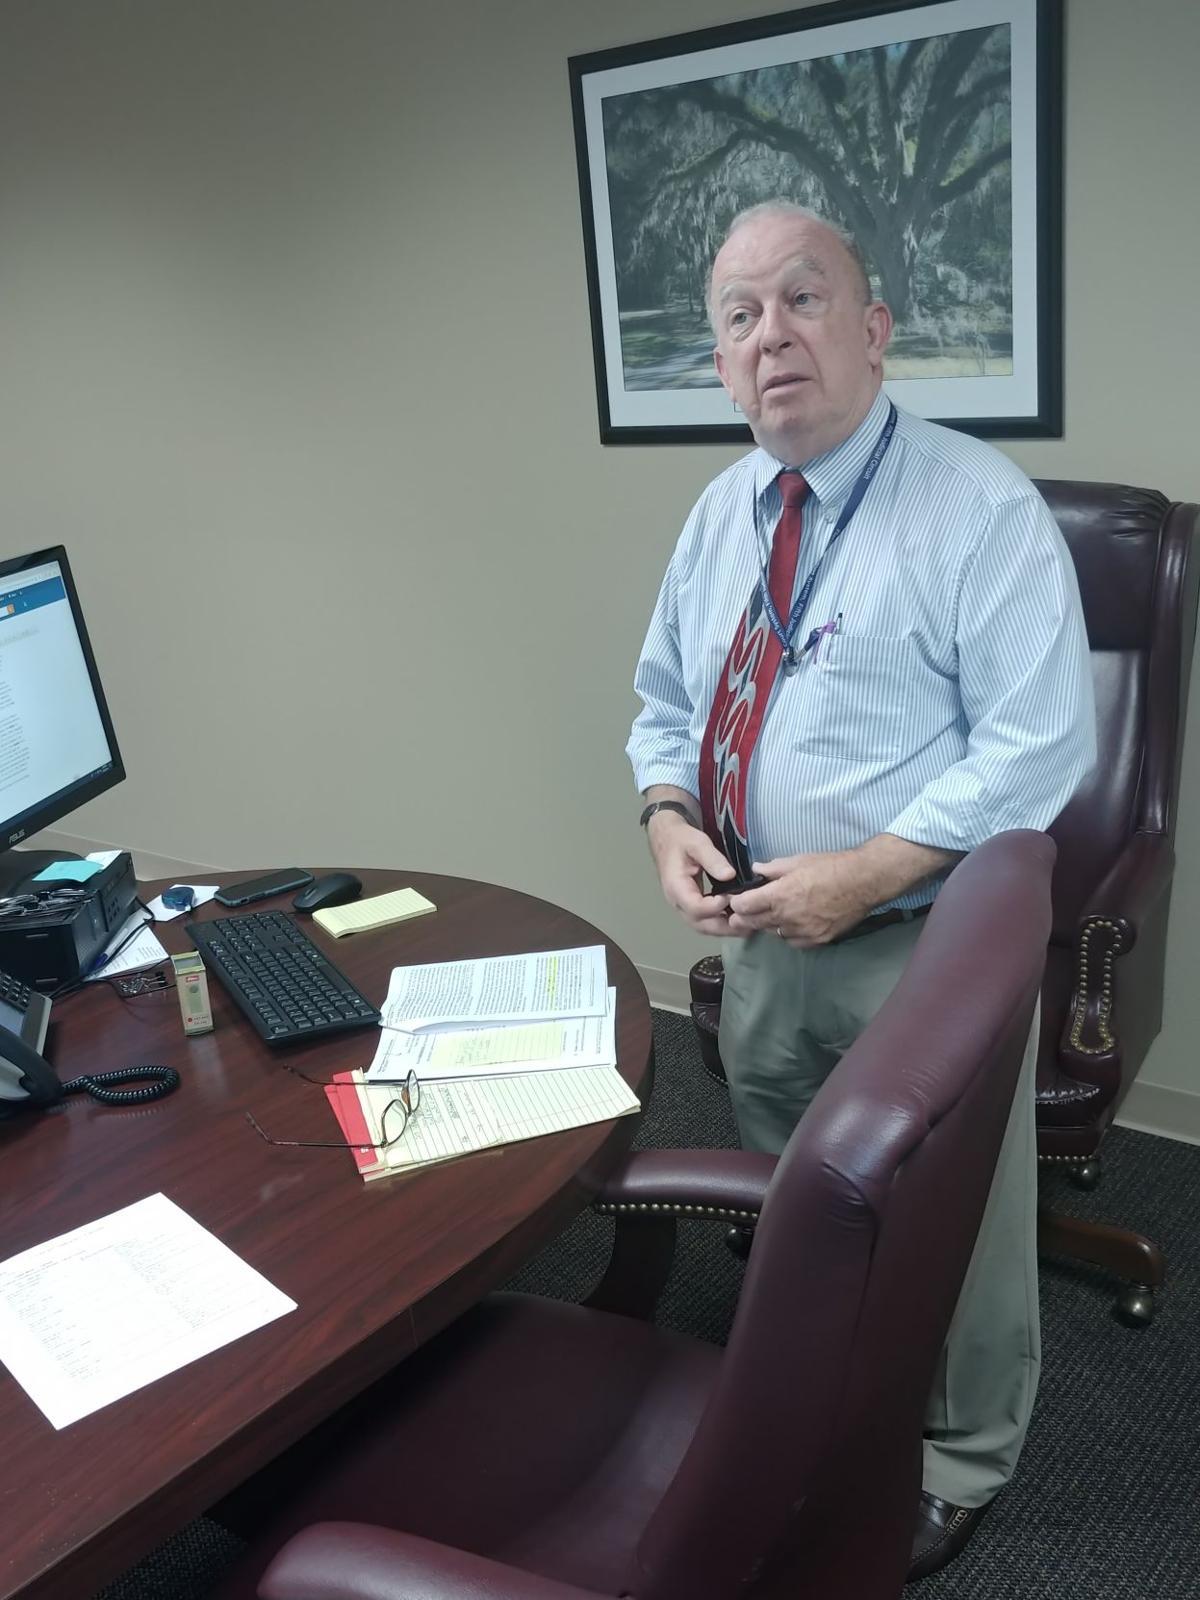 Senior Judge Vince Murphy